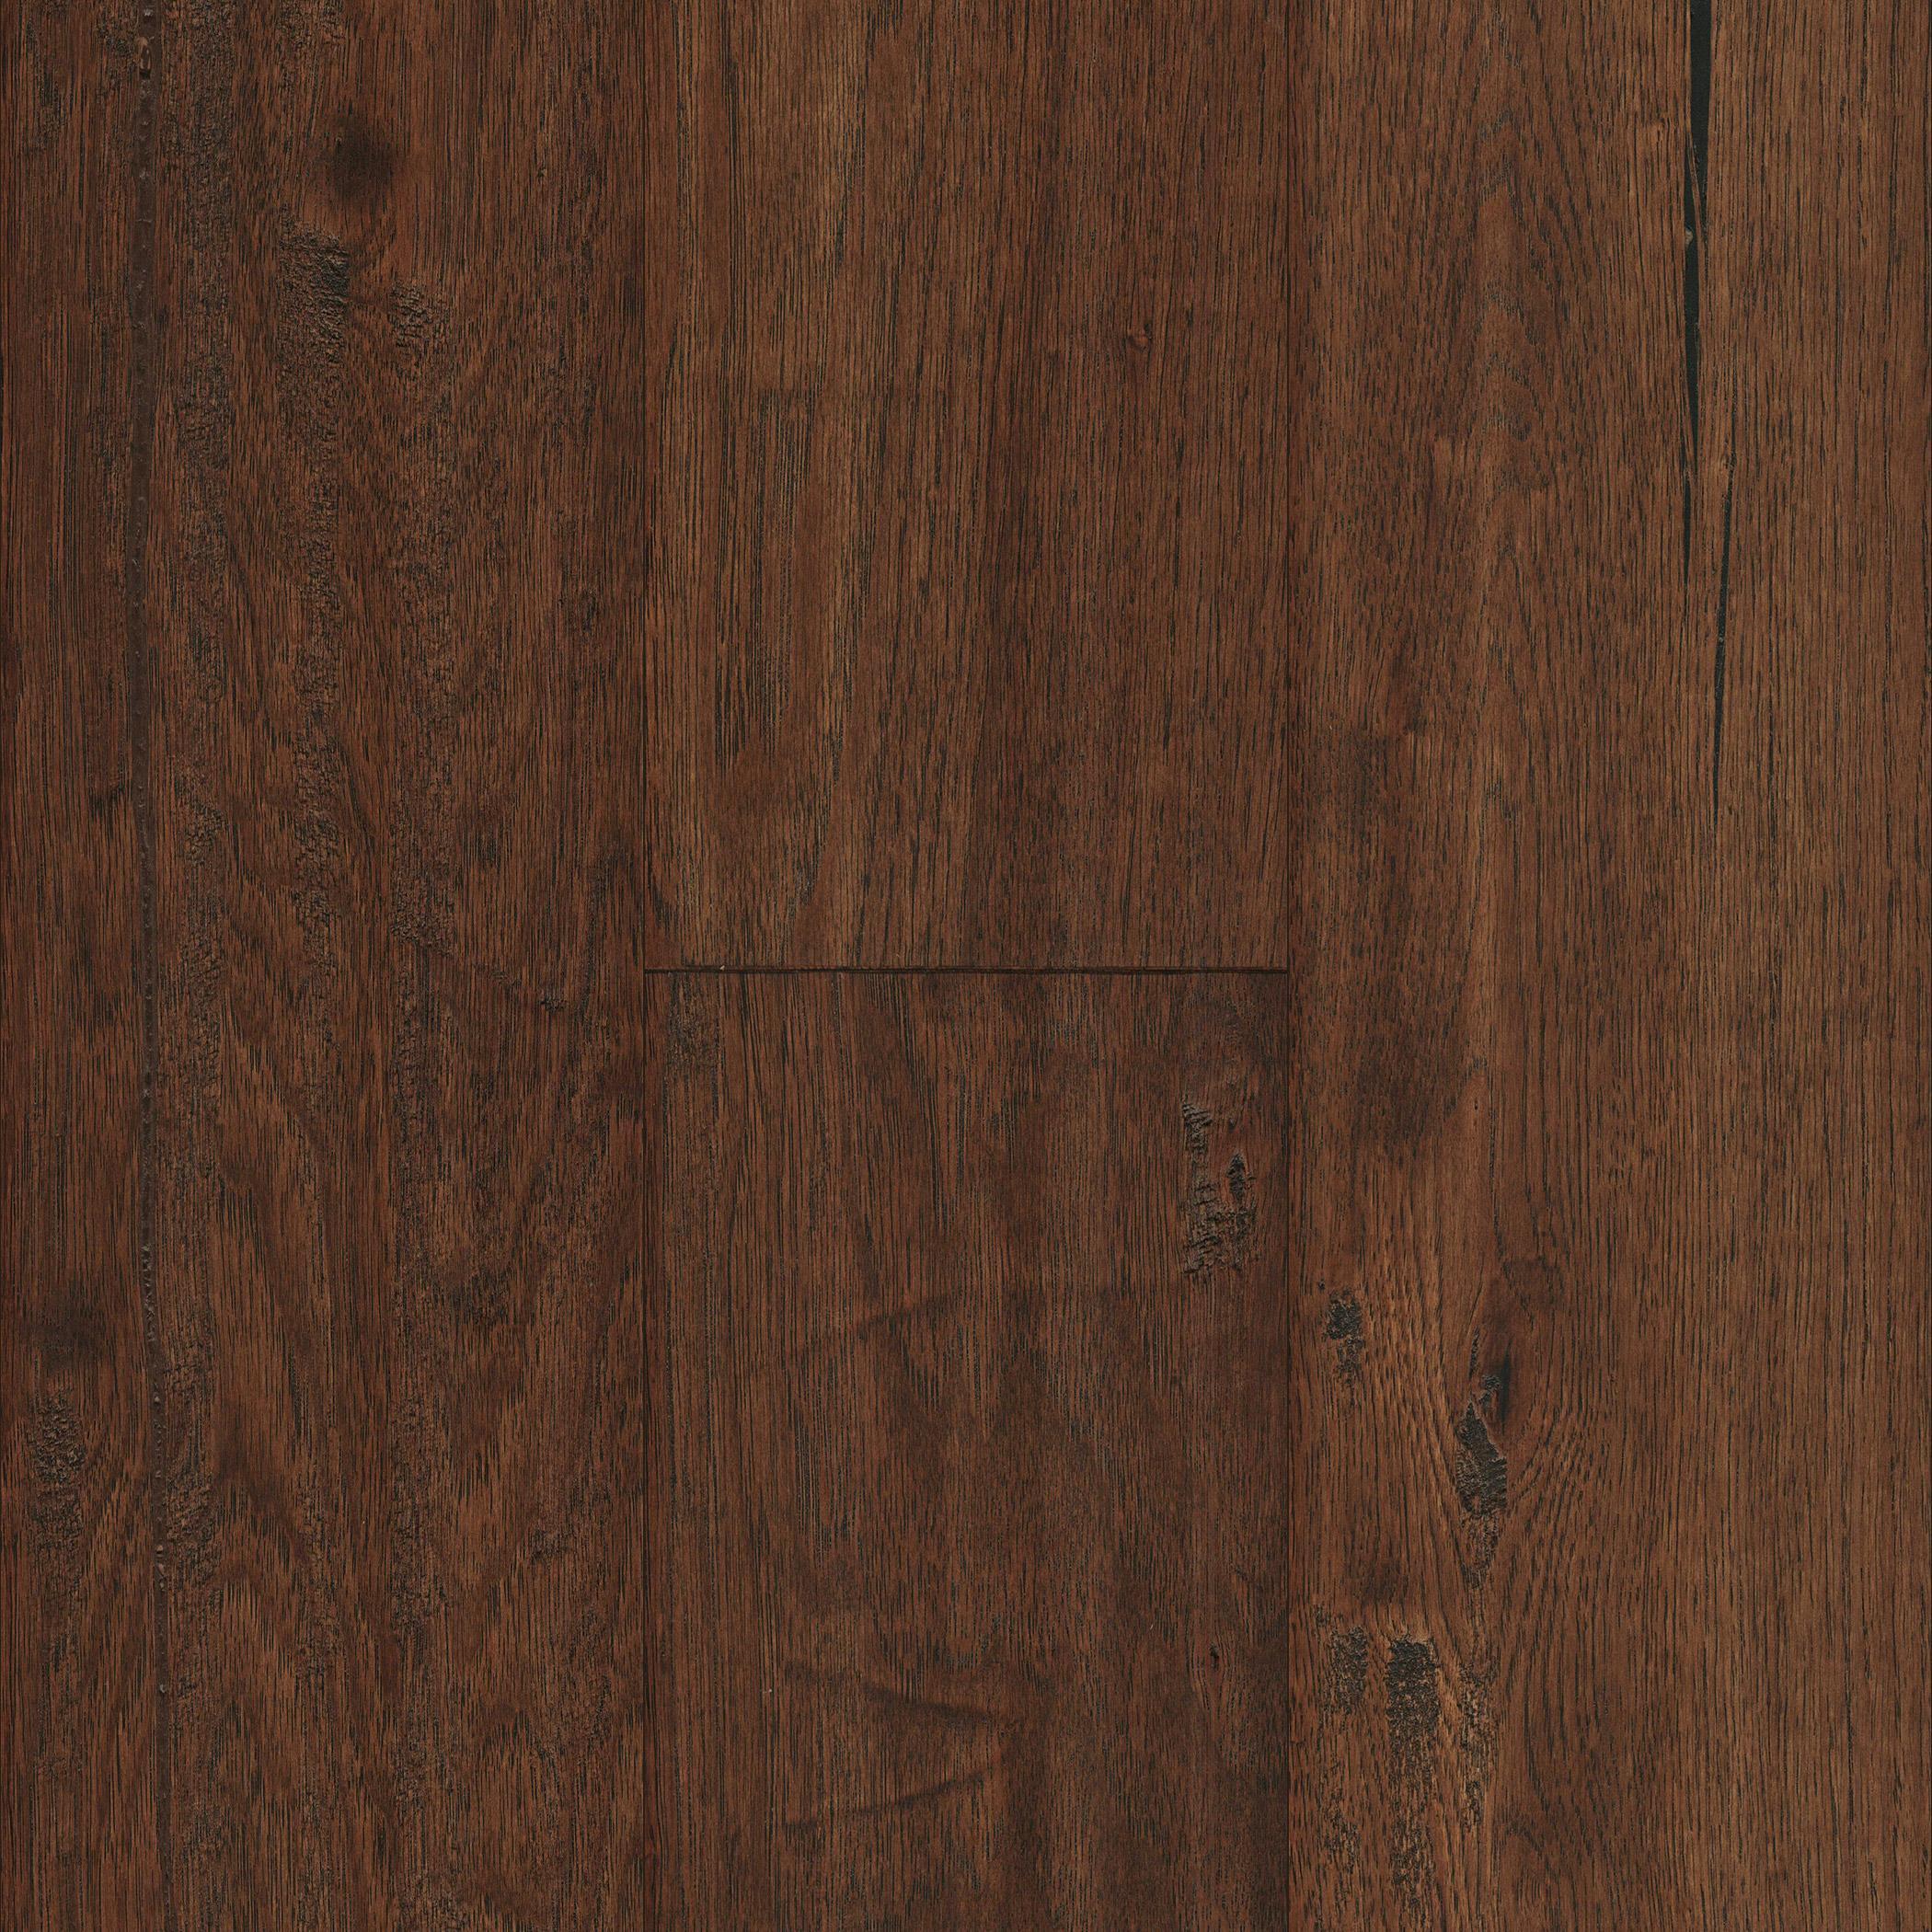 3 4 engineered hardwood flooring of mullican san marco hickory provincial 7 sculpted engineered intended for mullican san marco hickory provincial 7 sculpted engineered hardwood flooring